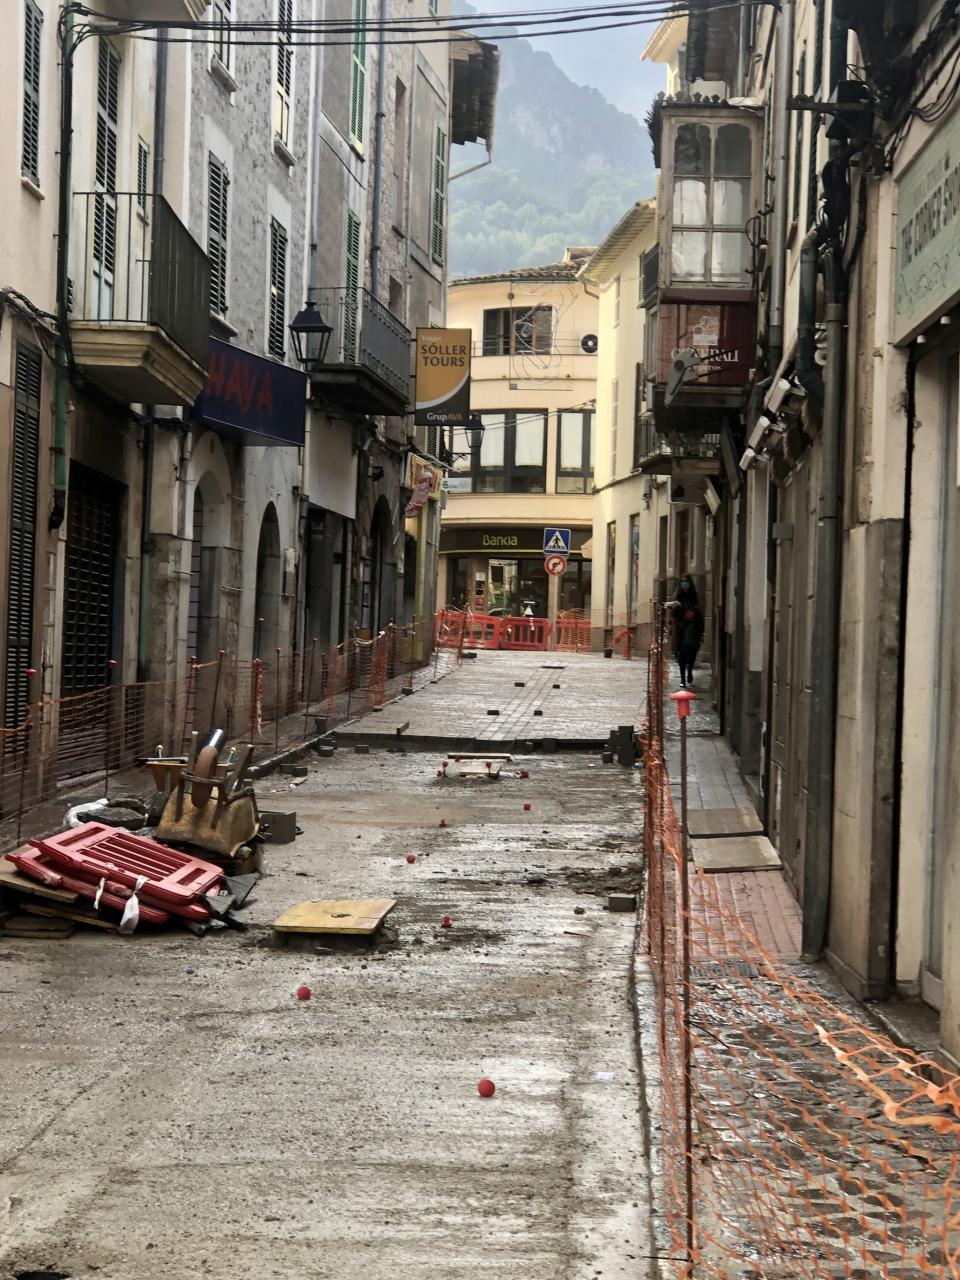 The street repairs